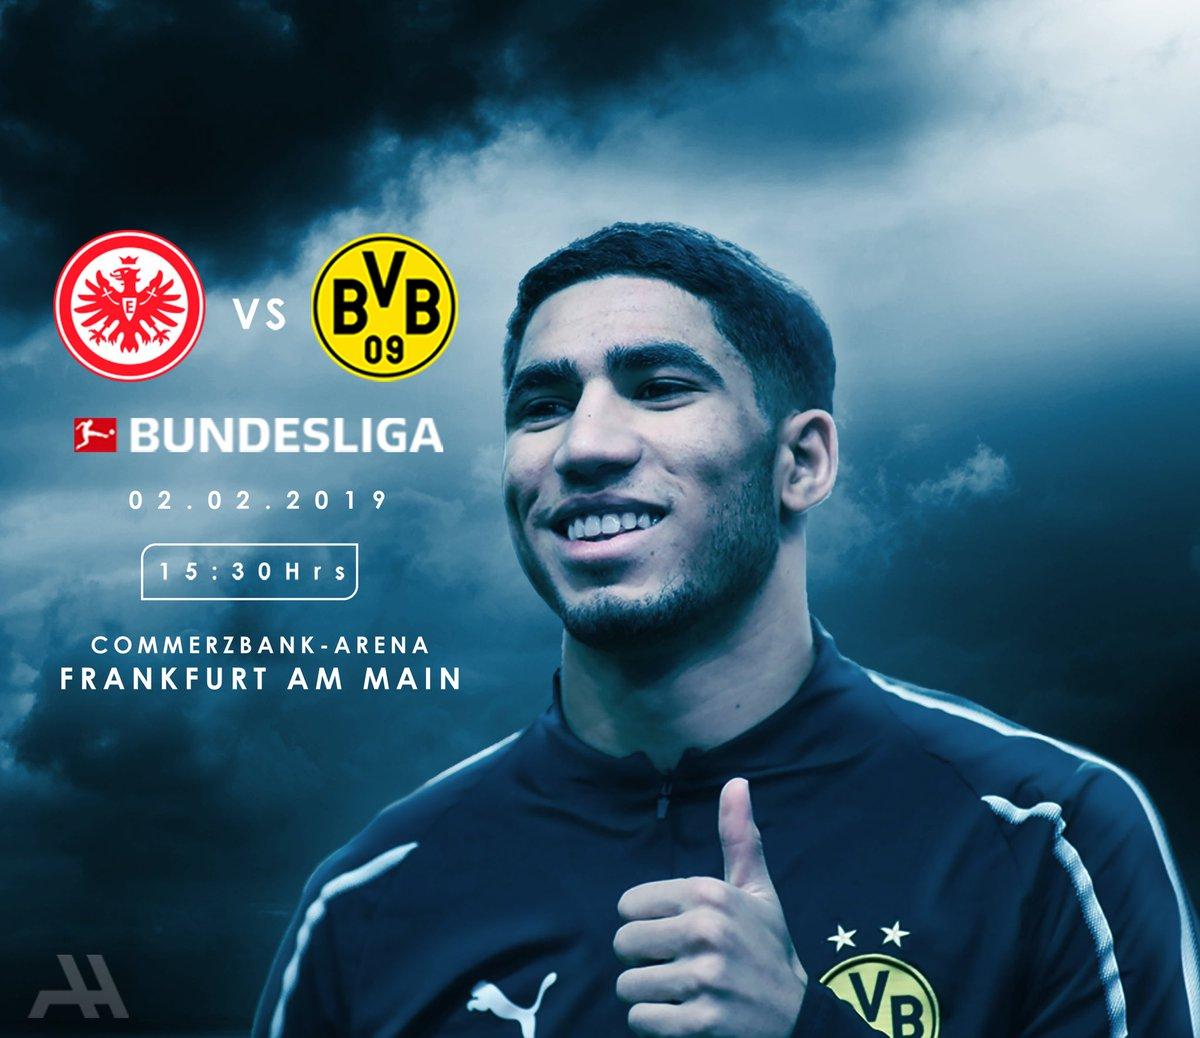 🏆 Bundesliga  🆚 Eintracht Frankfurt 🏟 Commerzbank-Arena  🗓️ Saturday, February 2nd ⏰ 15:30 ⚽️🐝 #SGEBVB